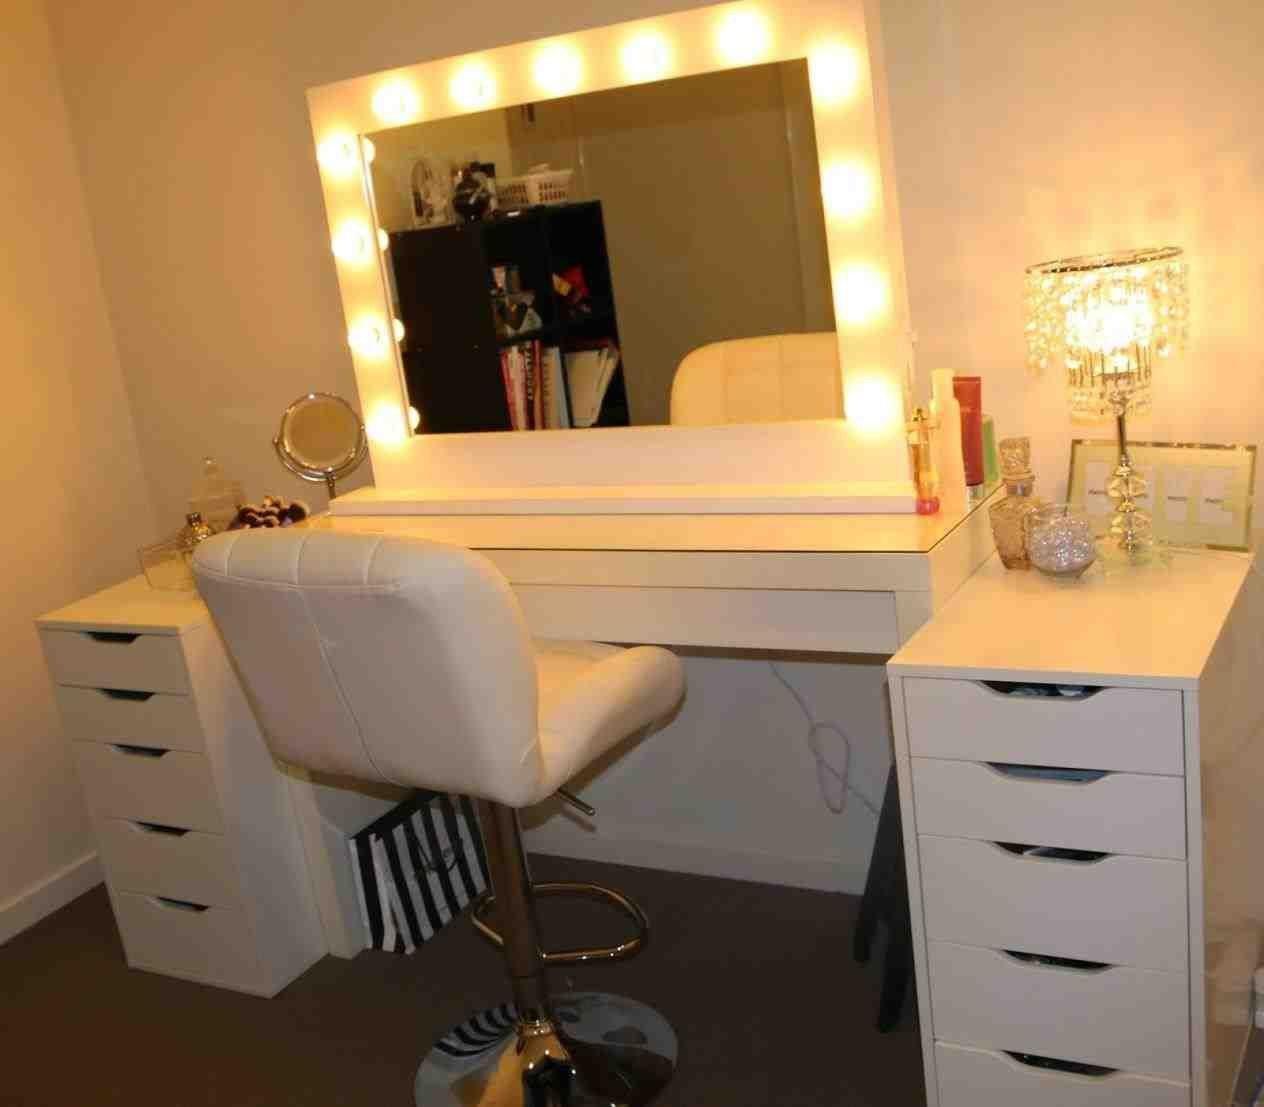 Vanity Mirror with Light for Bedroom Fresh ριитєяєѕт Bellakerz ♚